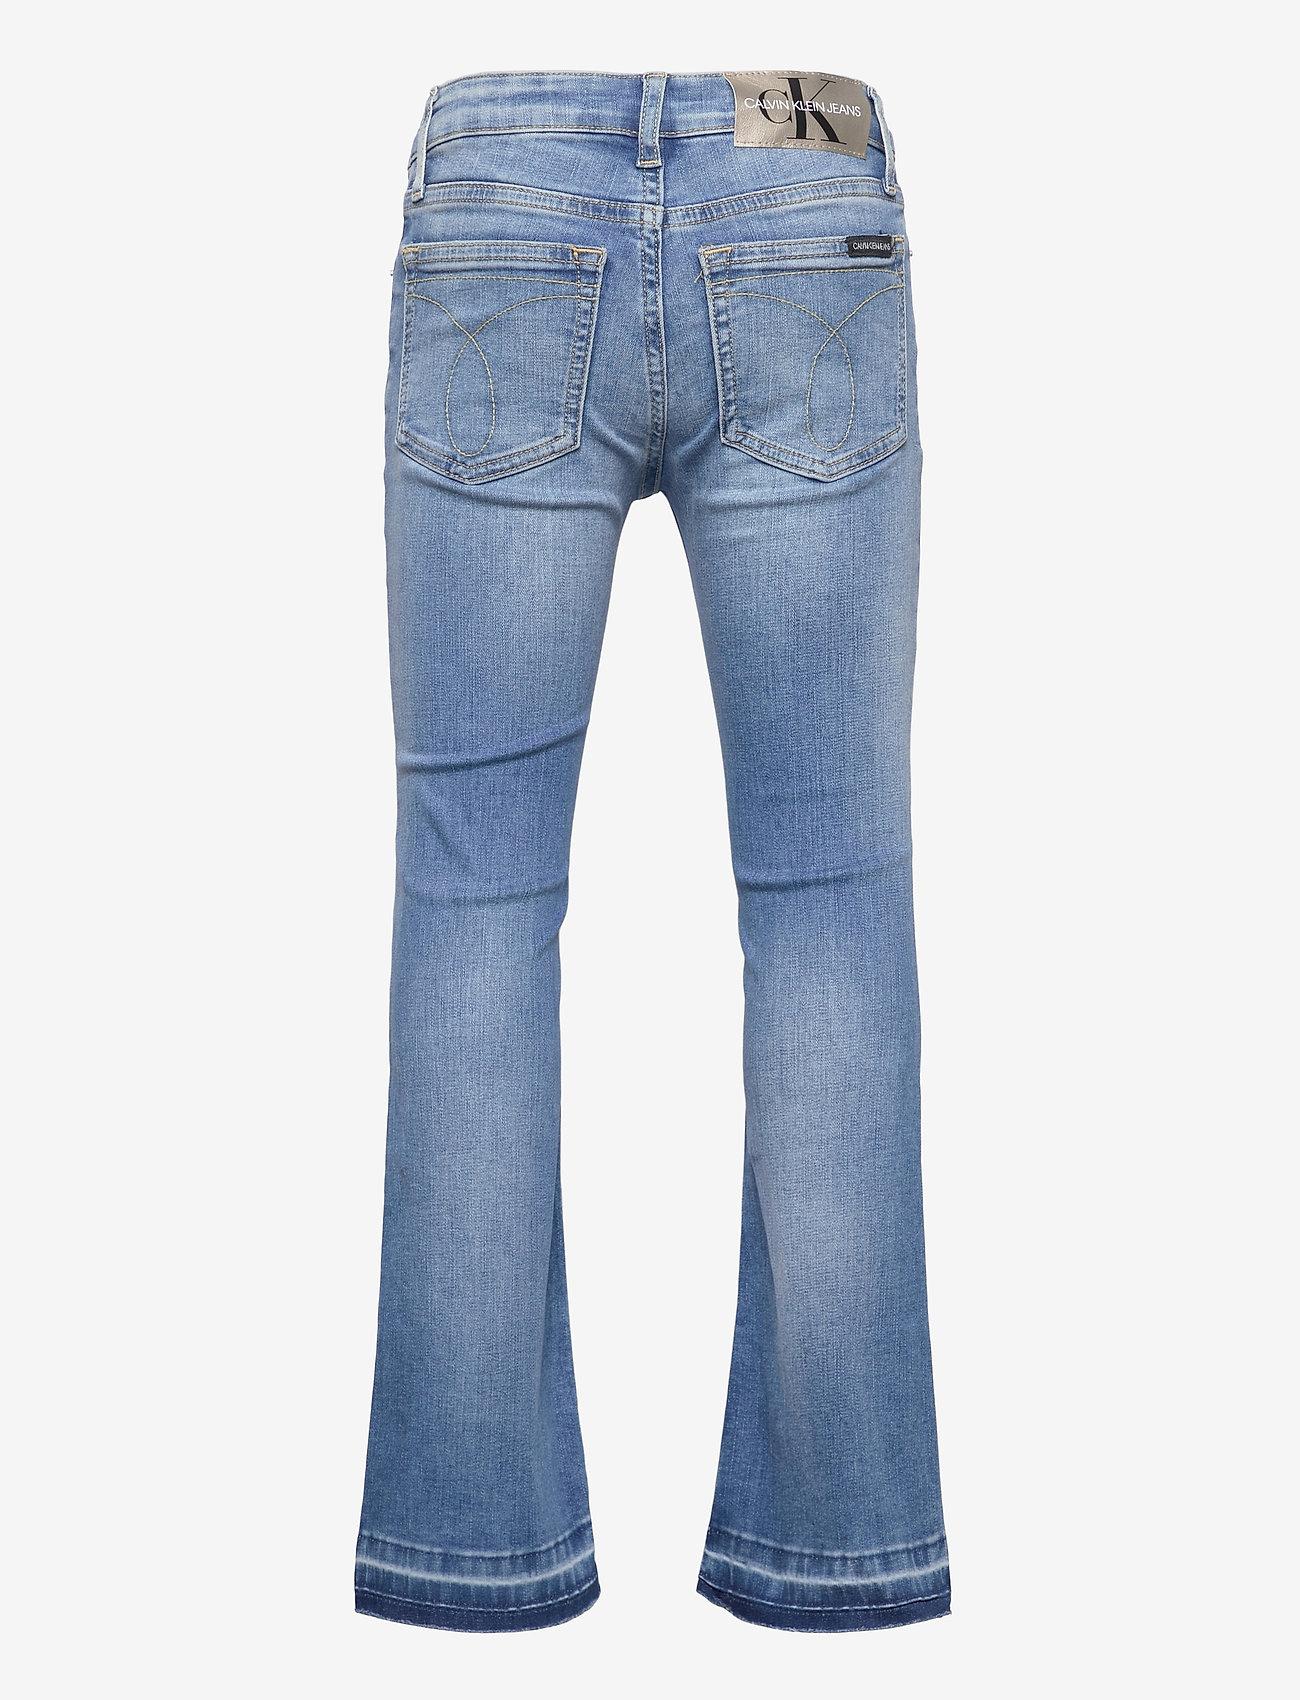 Calvin Klein - FLARE MR INFINITE LIGHT BL STR - jeans - infinite light blue stretch - 1